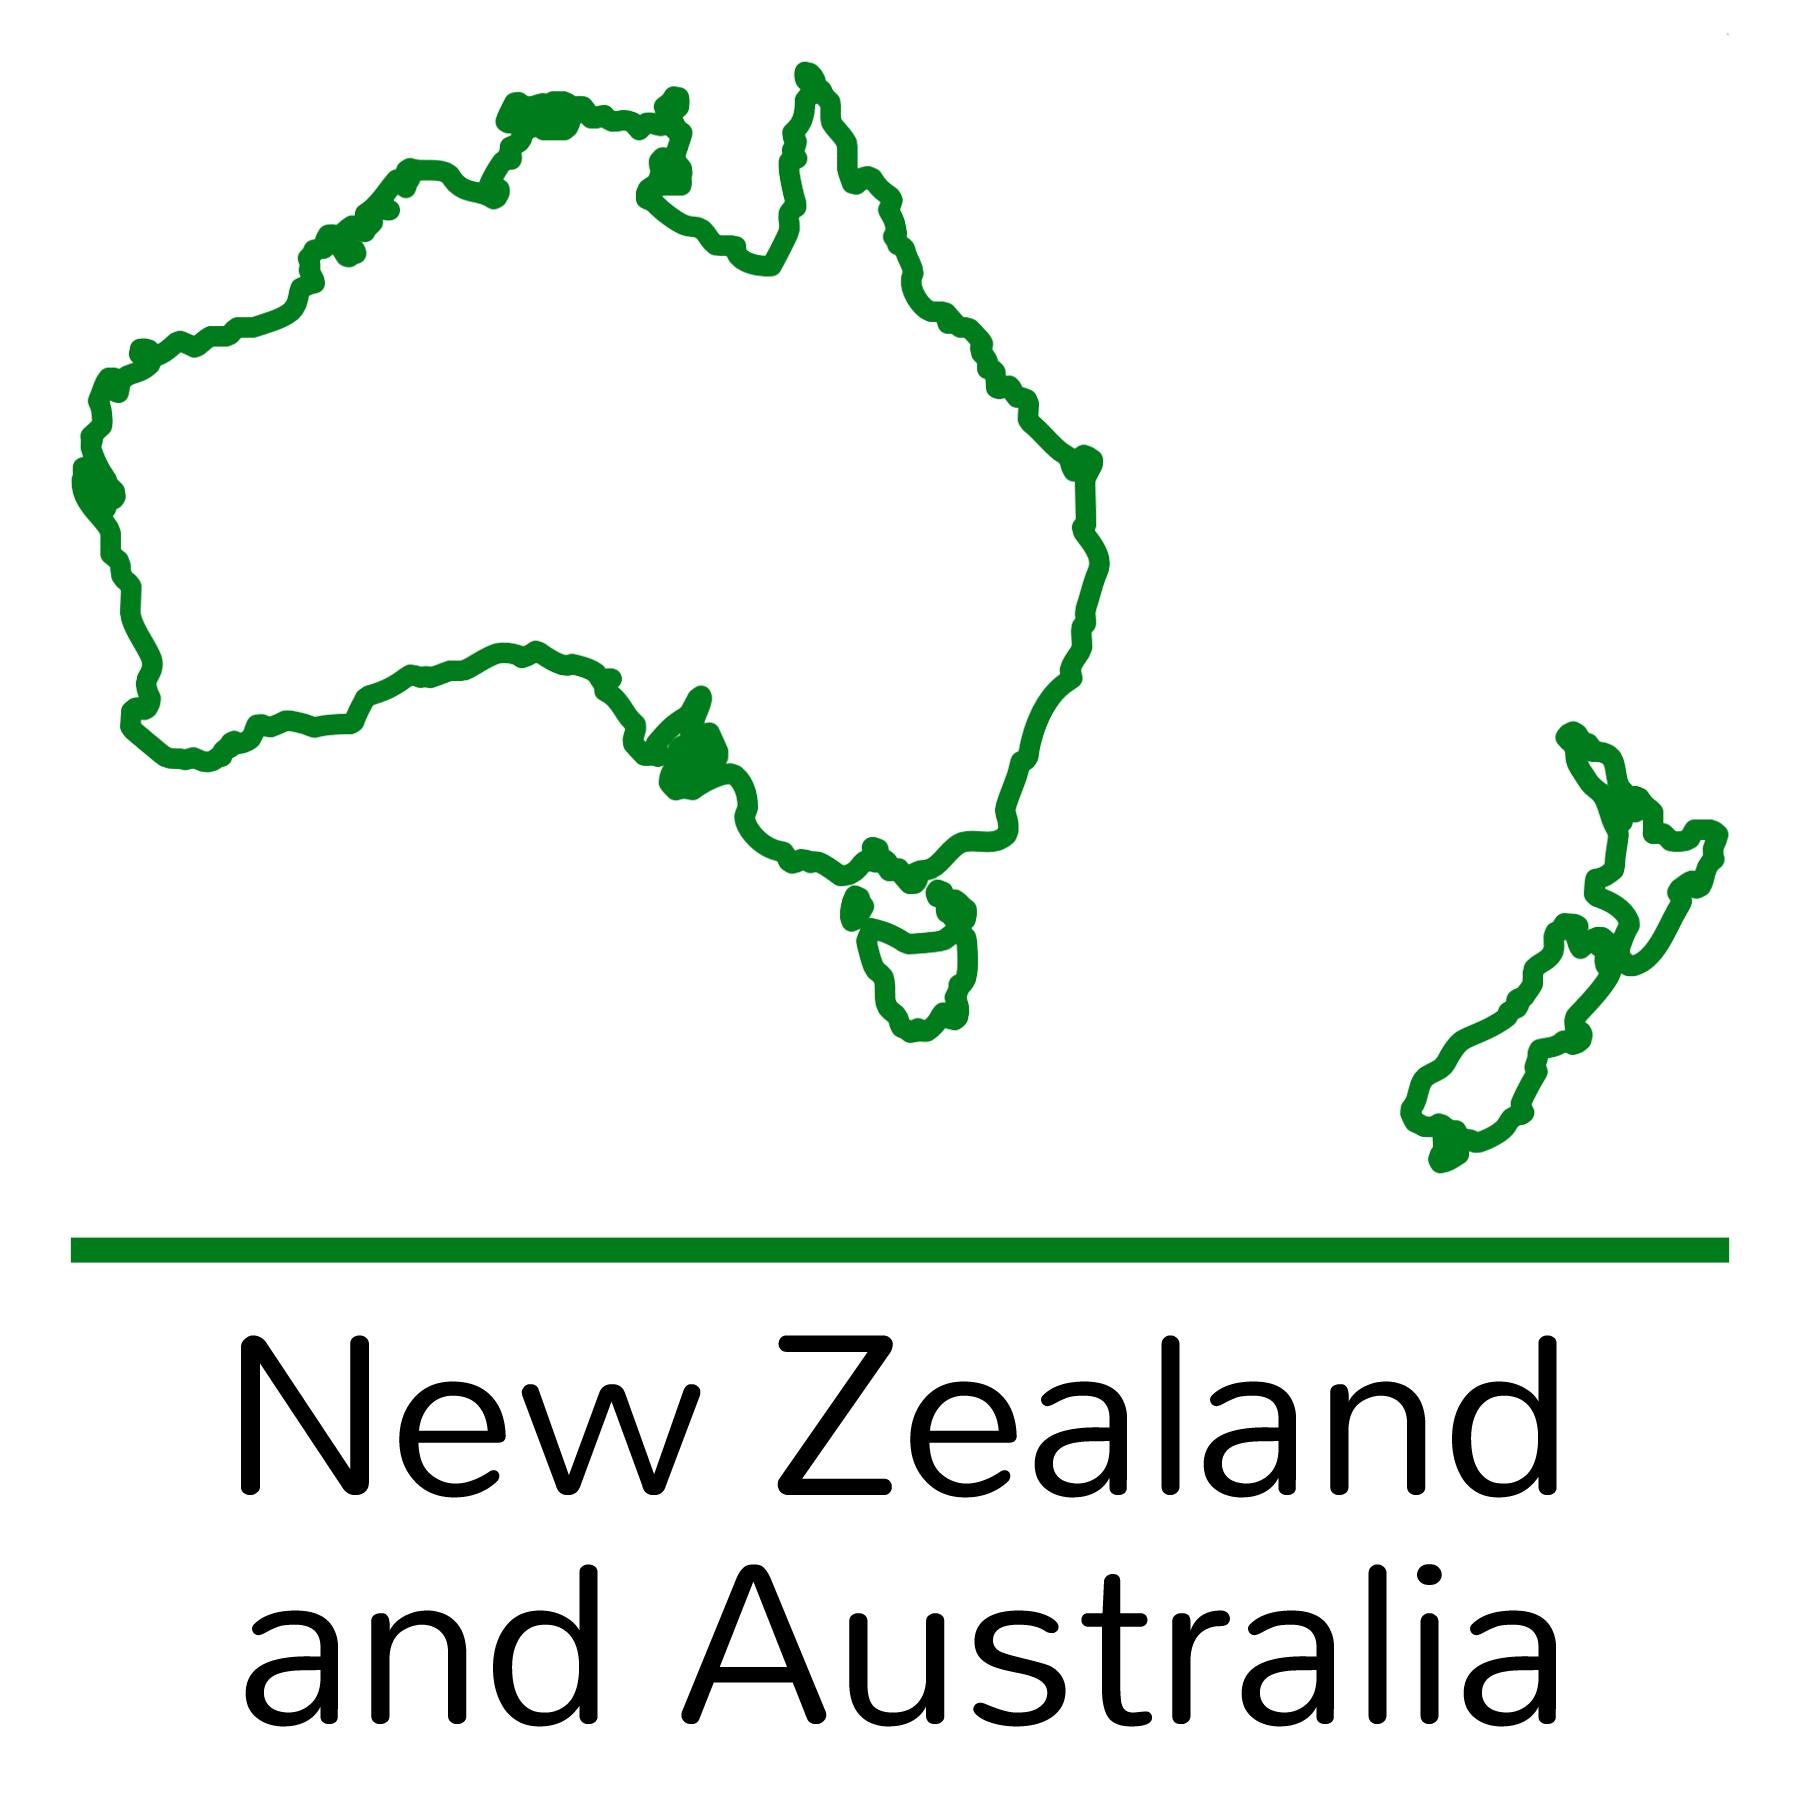 for New Zealand & Australia